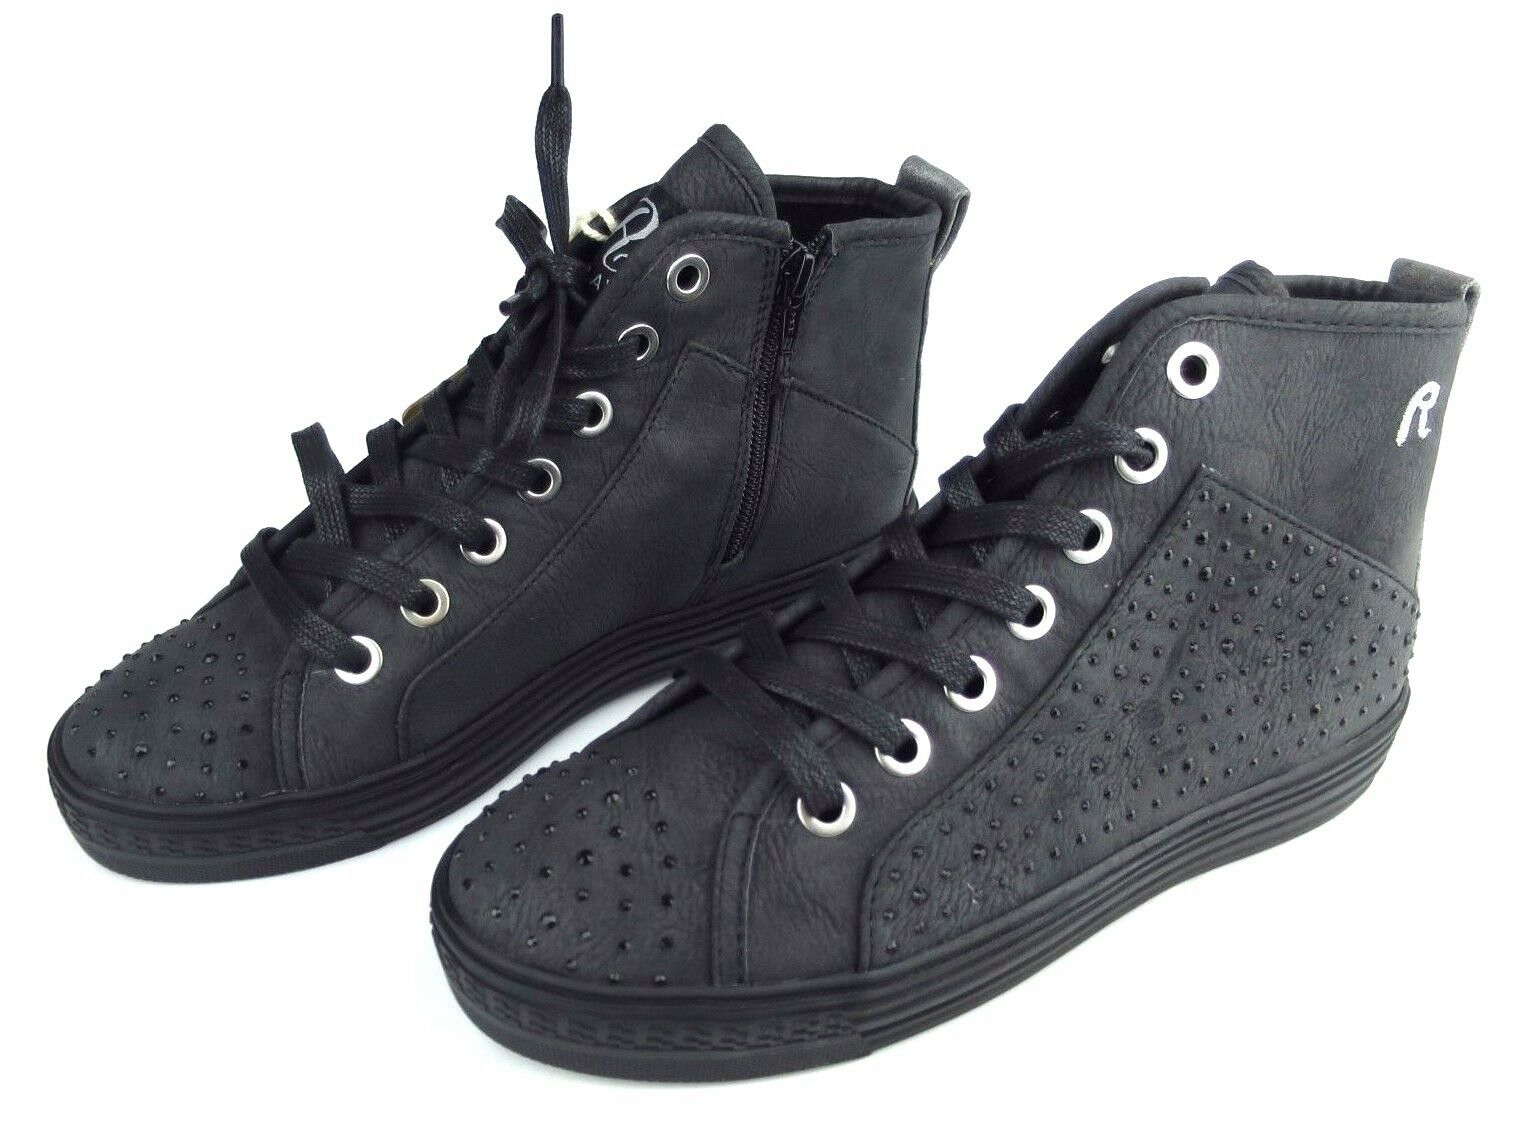 Replay Baskets maypo femmes chaussures Fille bottes femme bottes noir Neuf